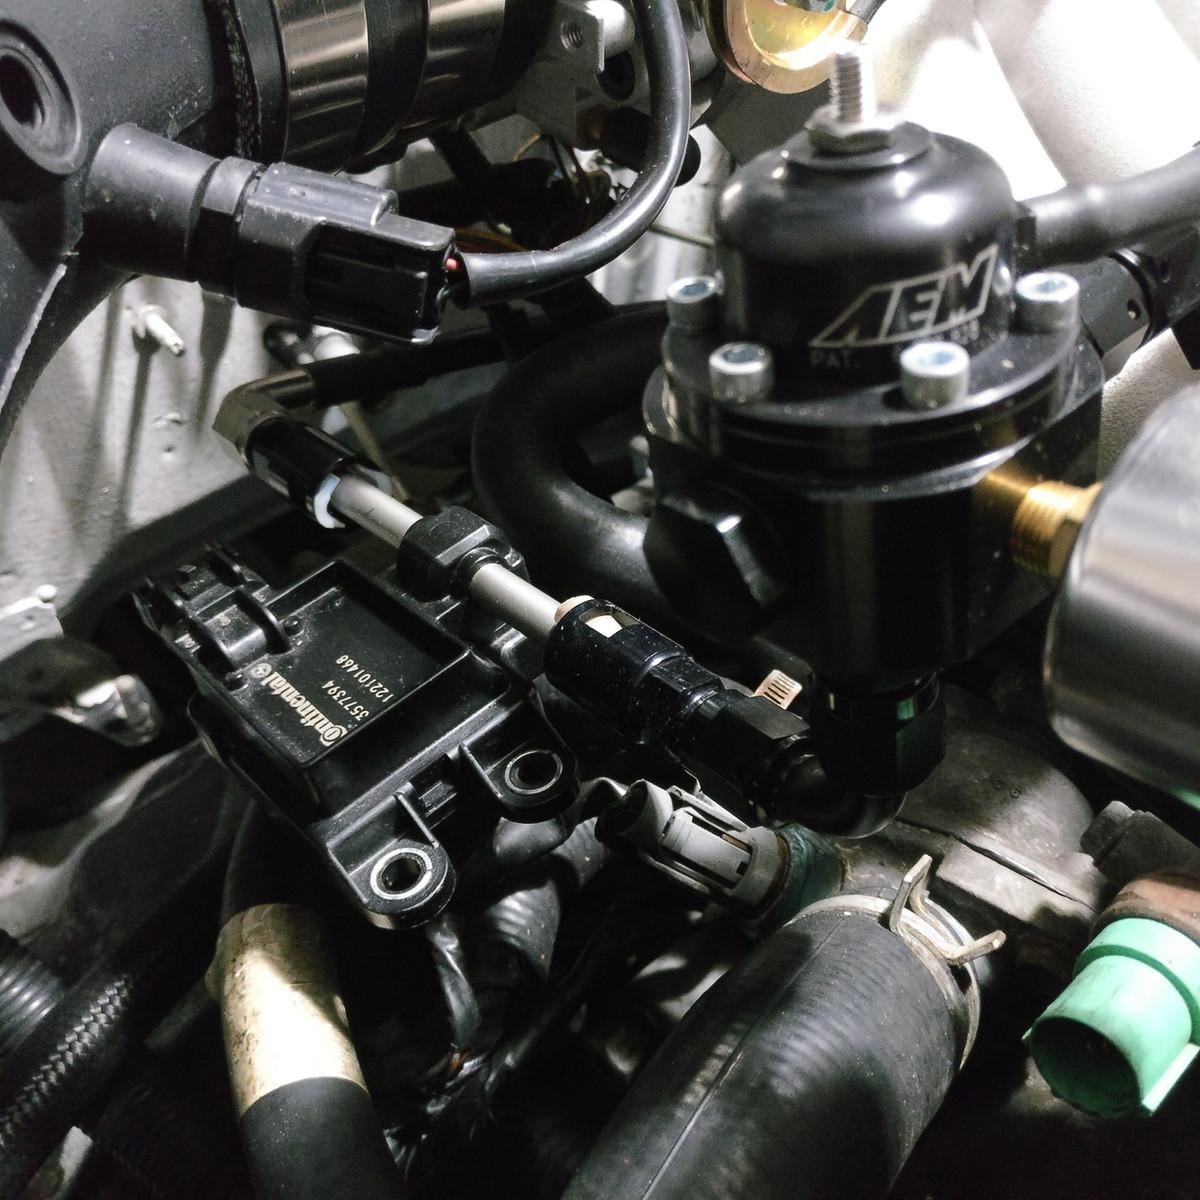 hight resolution of jbtuned flex fuel e85 fuel system conversion civic integra b d series